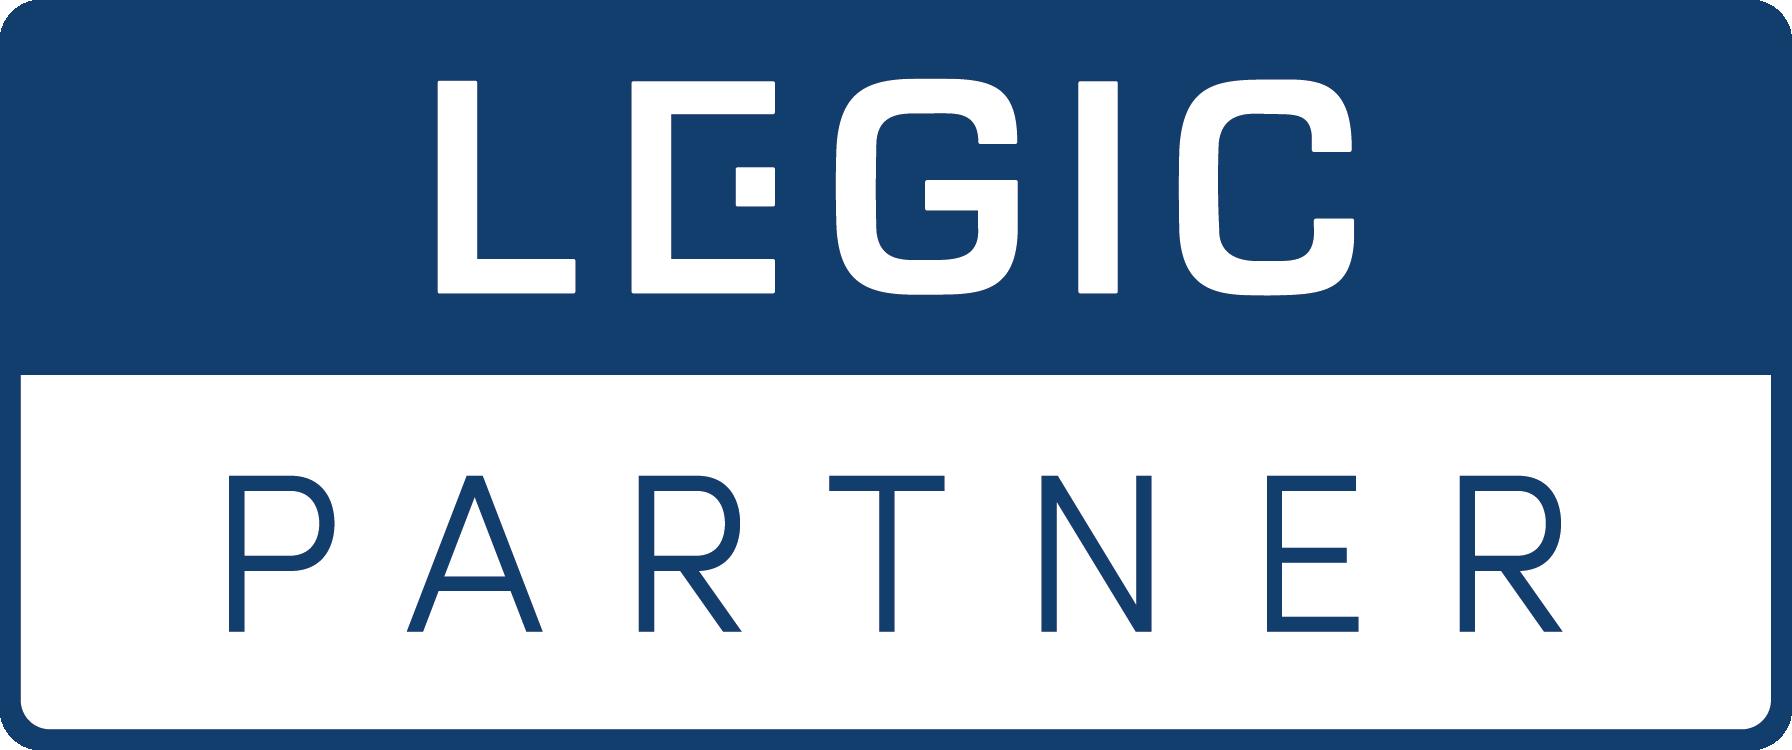 170830_HK_logo-legic-partner